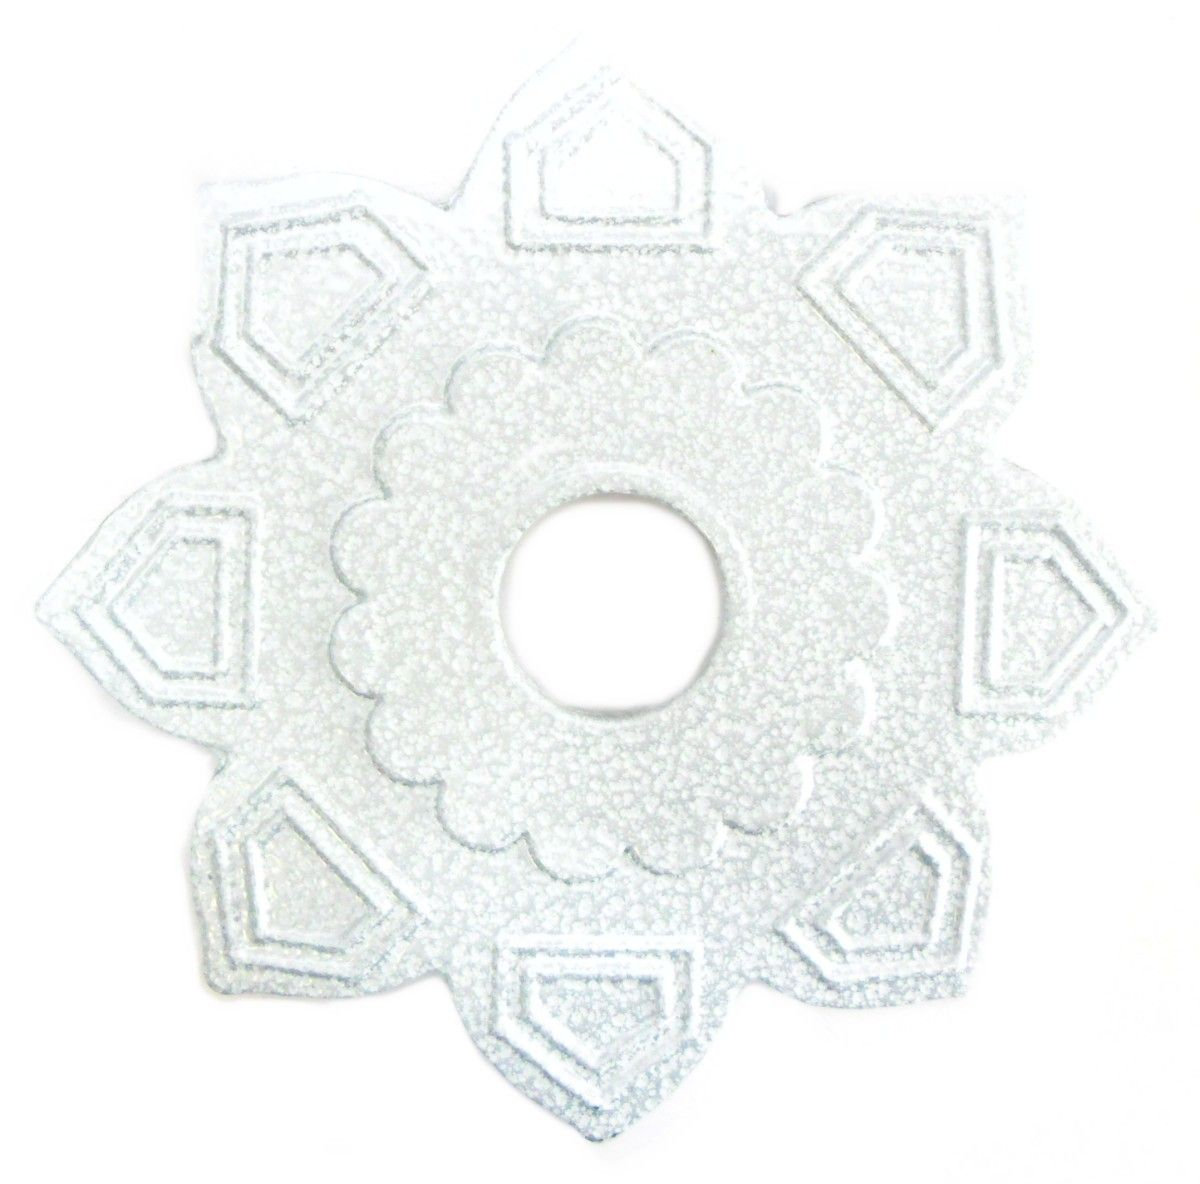 Prato para narguile marca Ranny em metal, formato estrela, 18cm de diâmetro. Cor Branco Martelado.